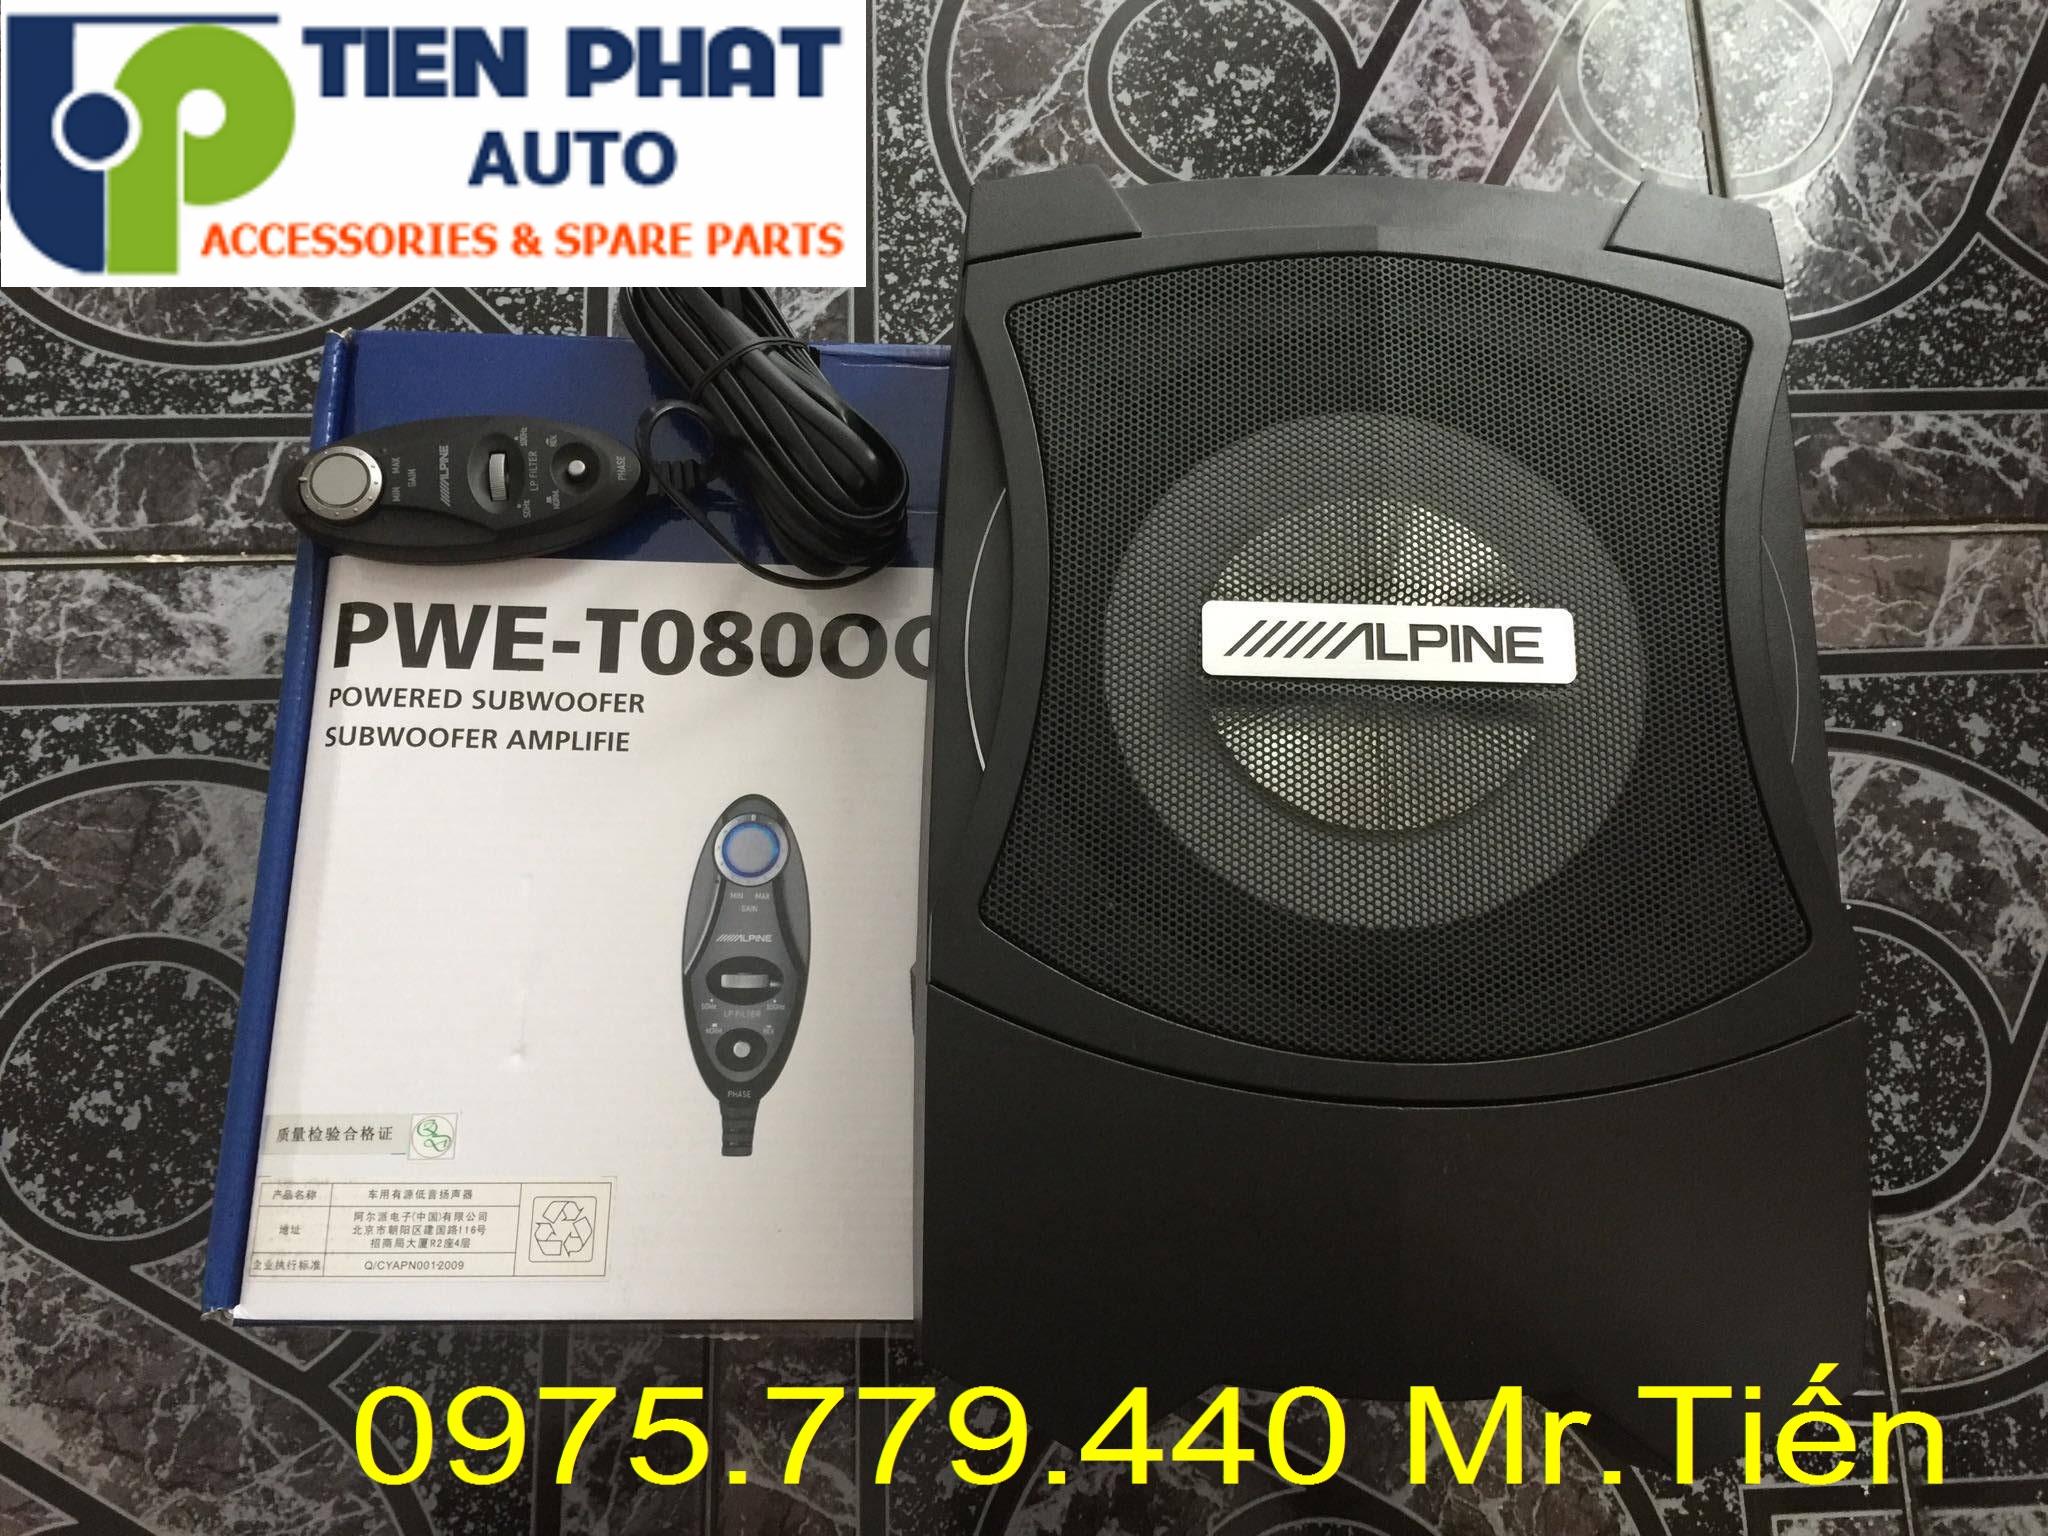 Lắp Loa sub Alpine PWE-T0800C cho Honda Acord Lắp Đặt Tận Nơi